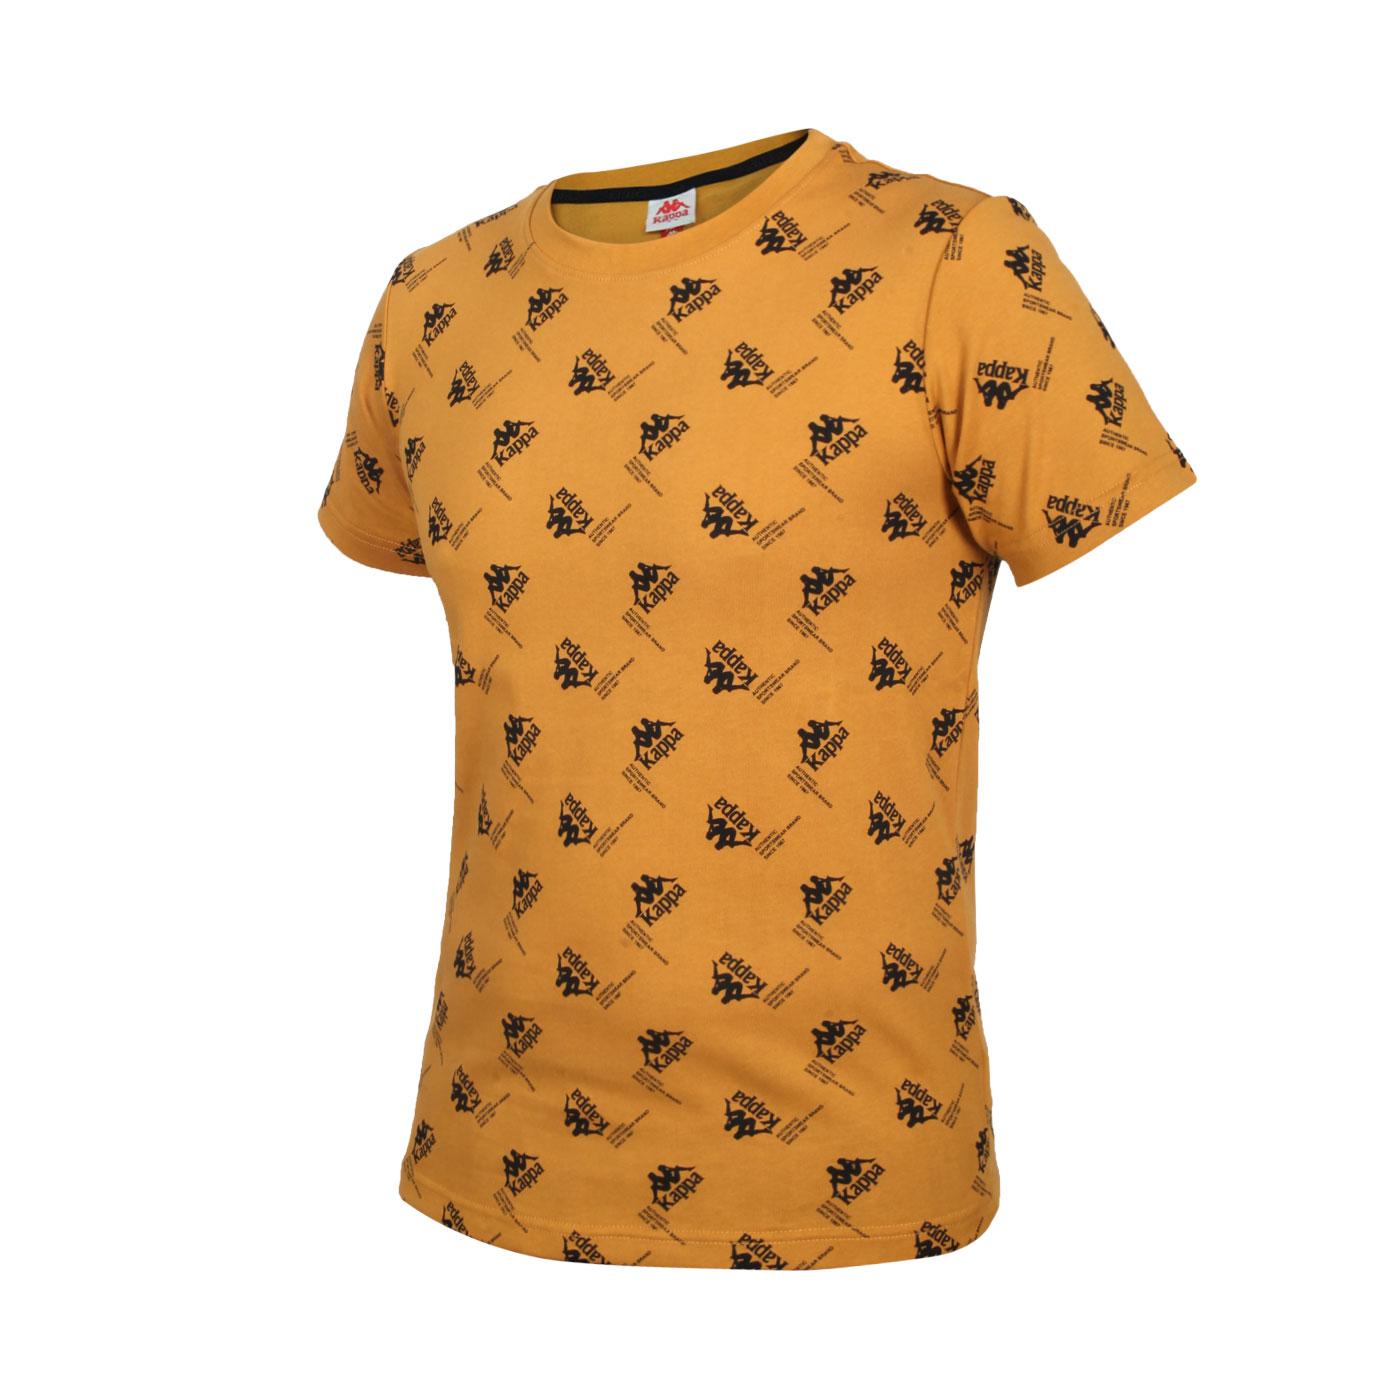 KAPPA 男款短袖T恤 321876W-Z07